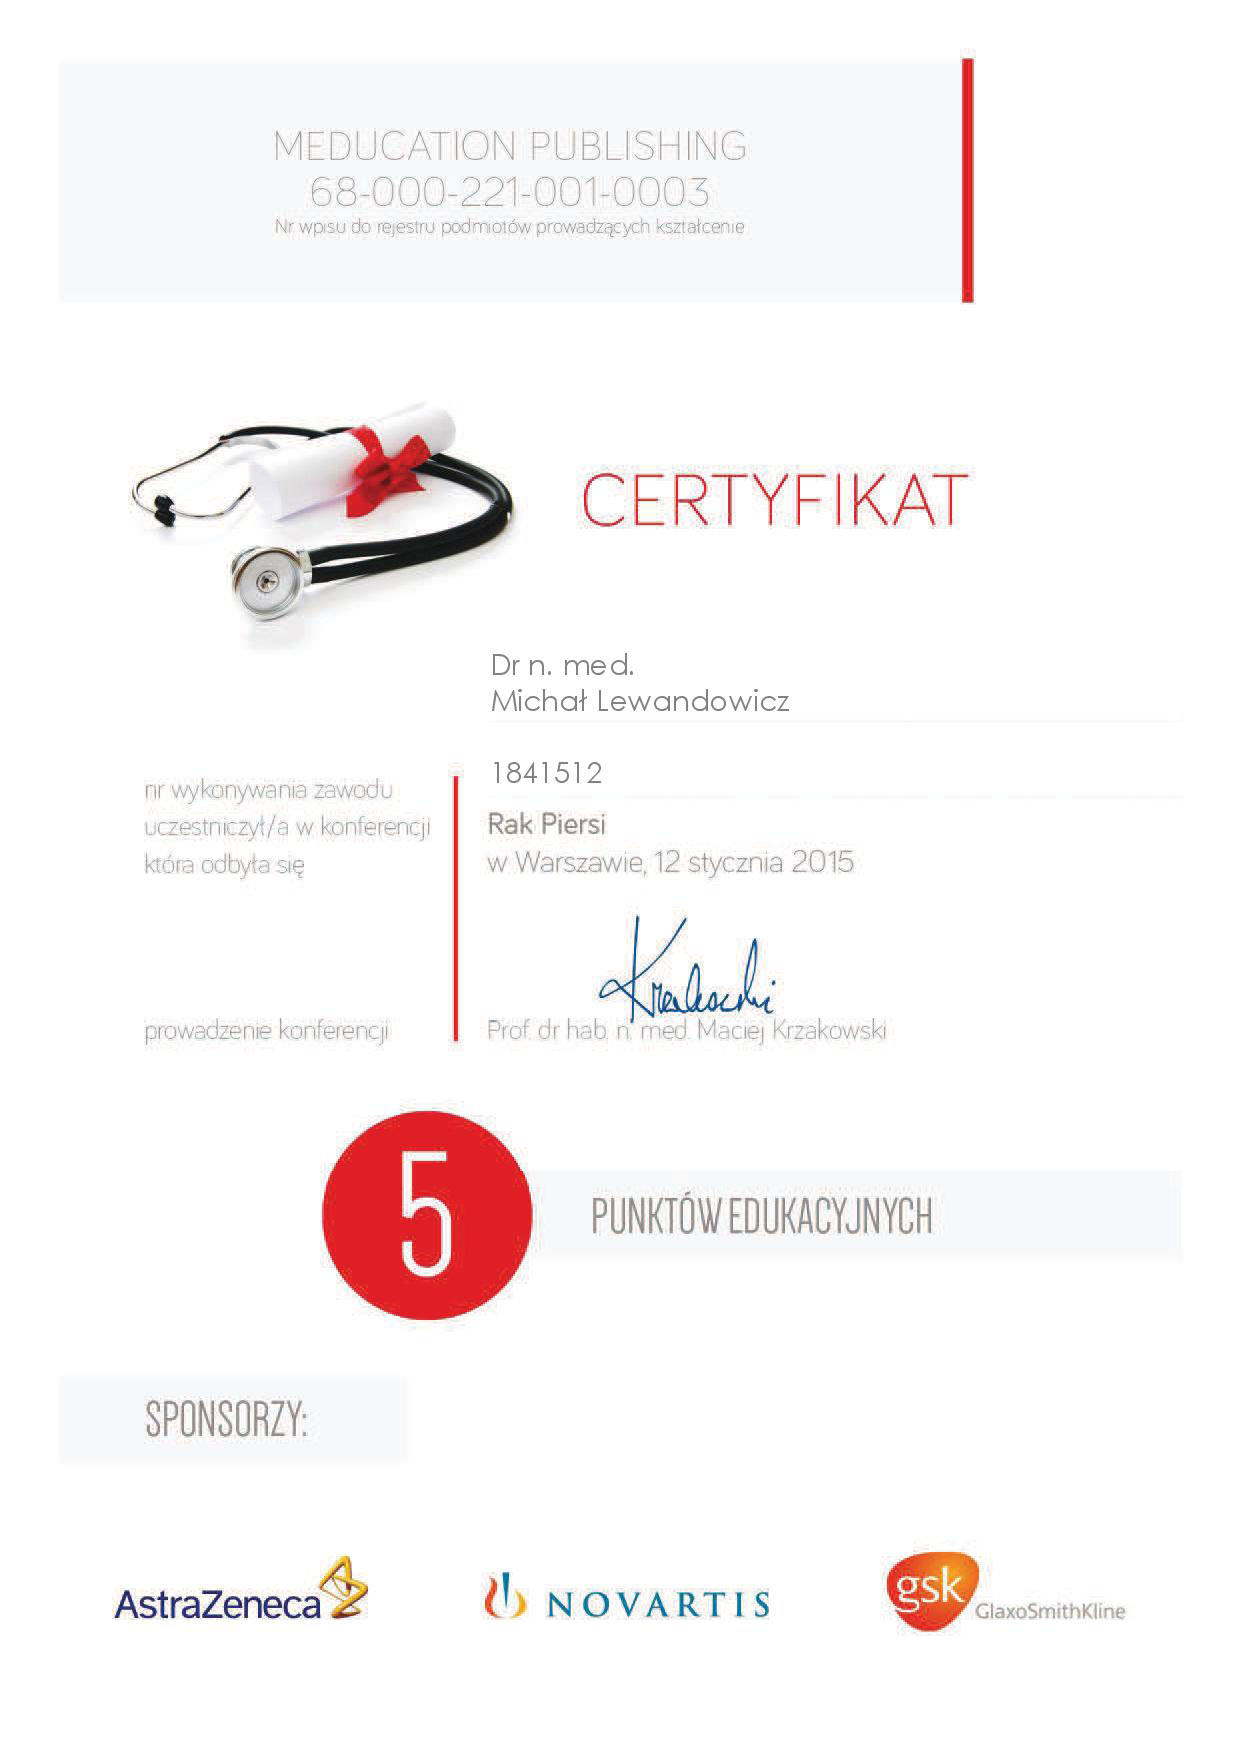 Cert 2015 01 12 Rak piersi - dr n. med. Michał Lewandowicz